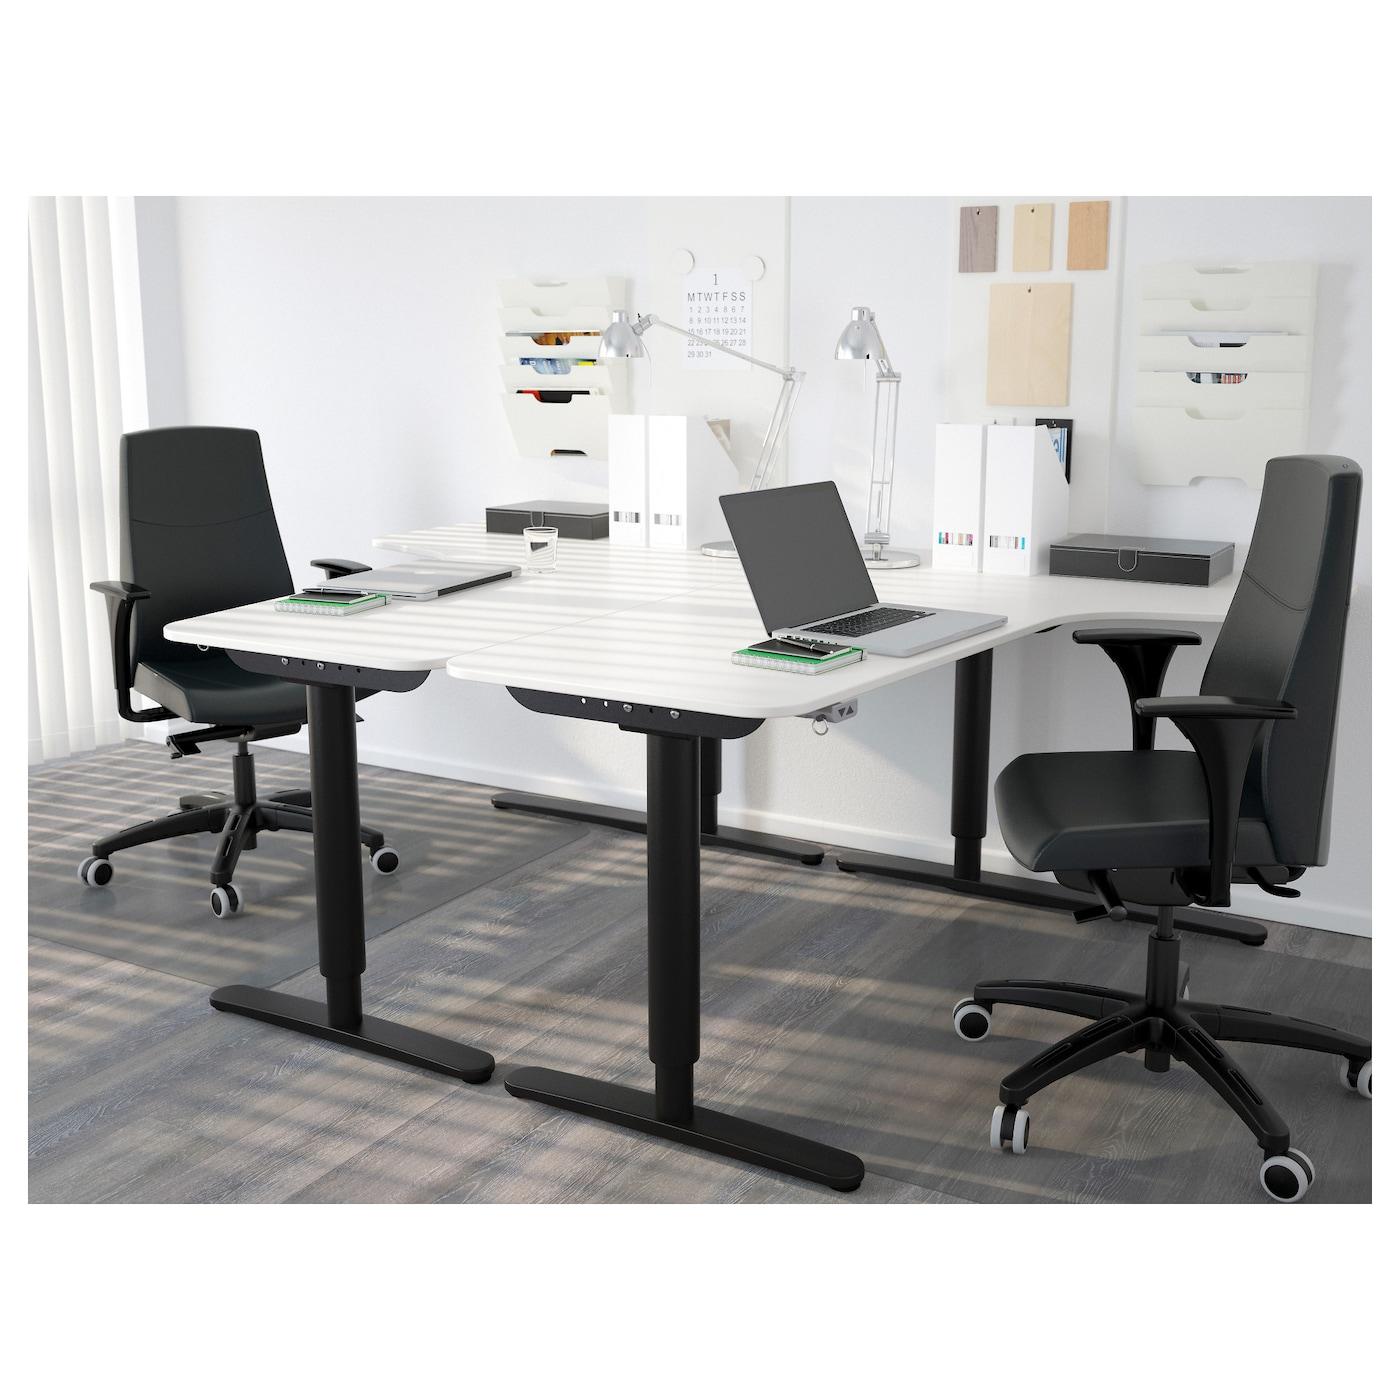 Bekant Left Hand Corner Table Top White 160x110 Cm Ikea Ireland